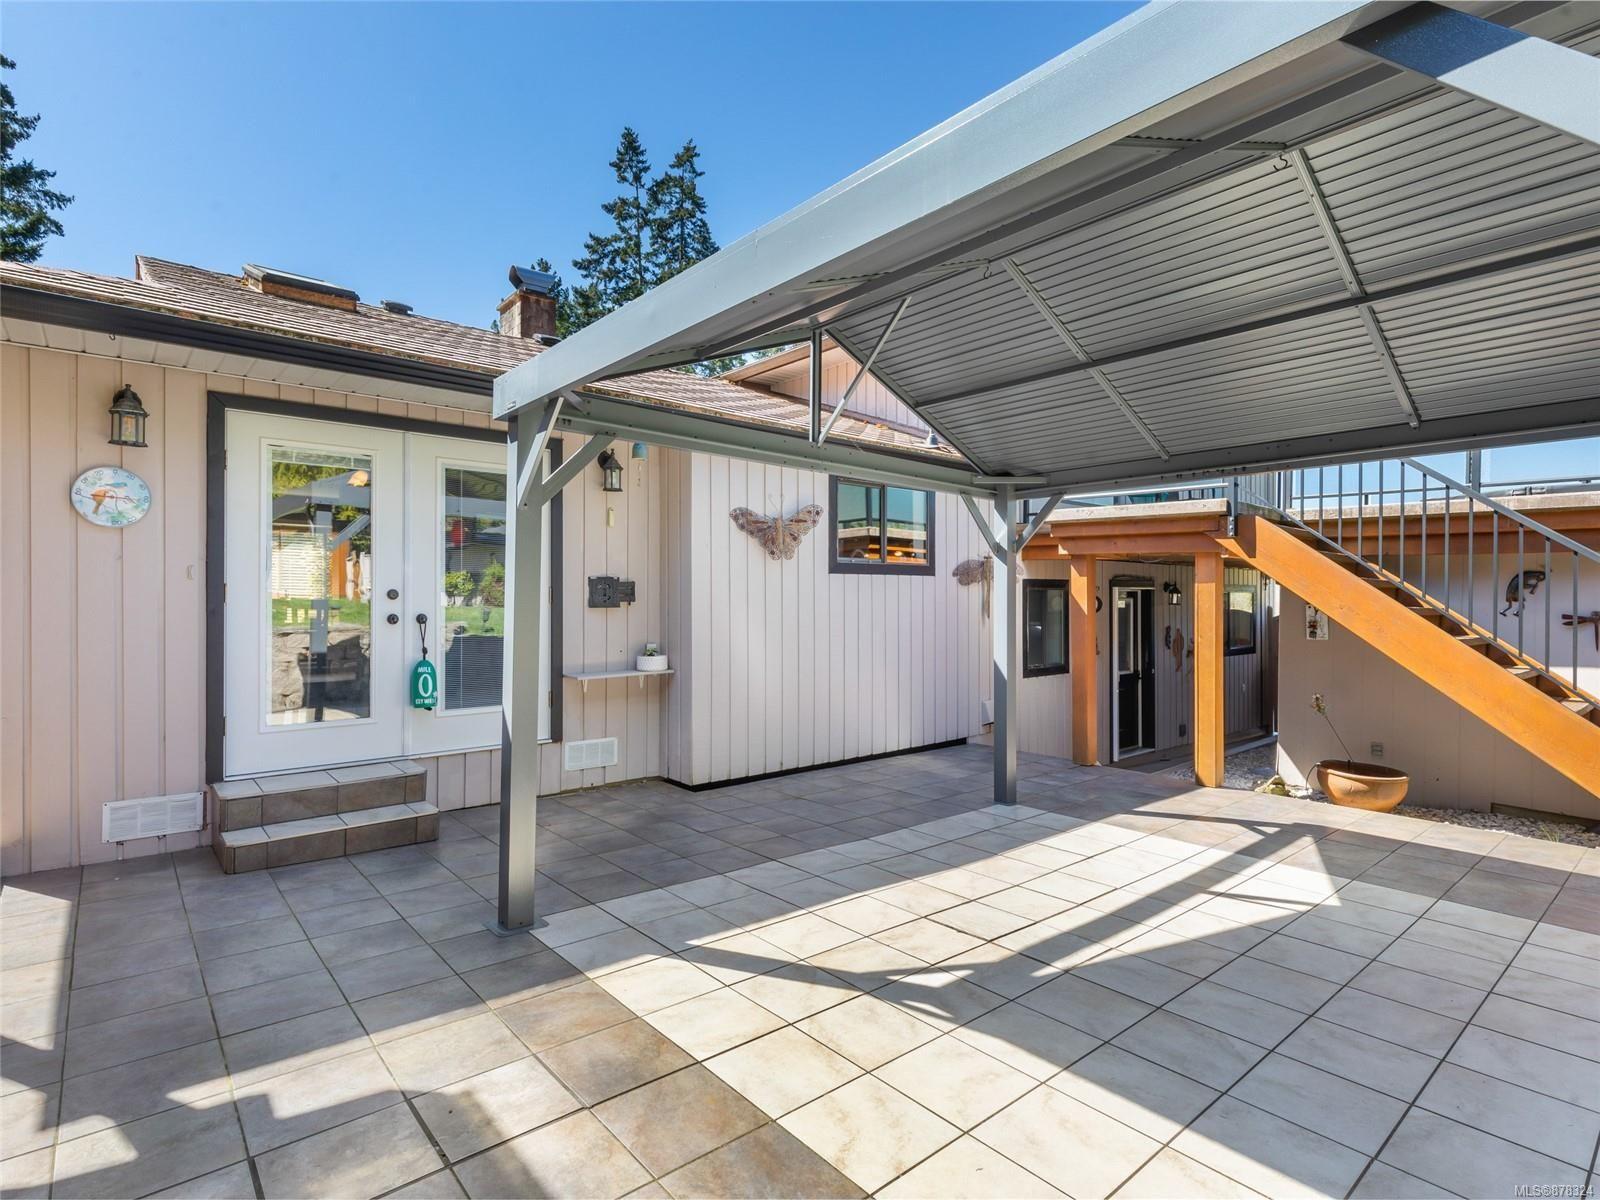 Photo 10: Photos: 3875 Moore Rd in : PA Port Alberni House for sale (Port Alberni)  : MLS®# 878324